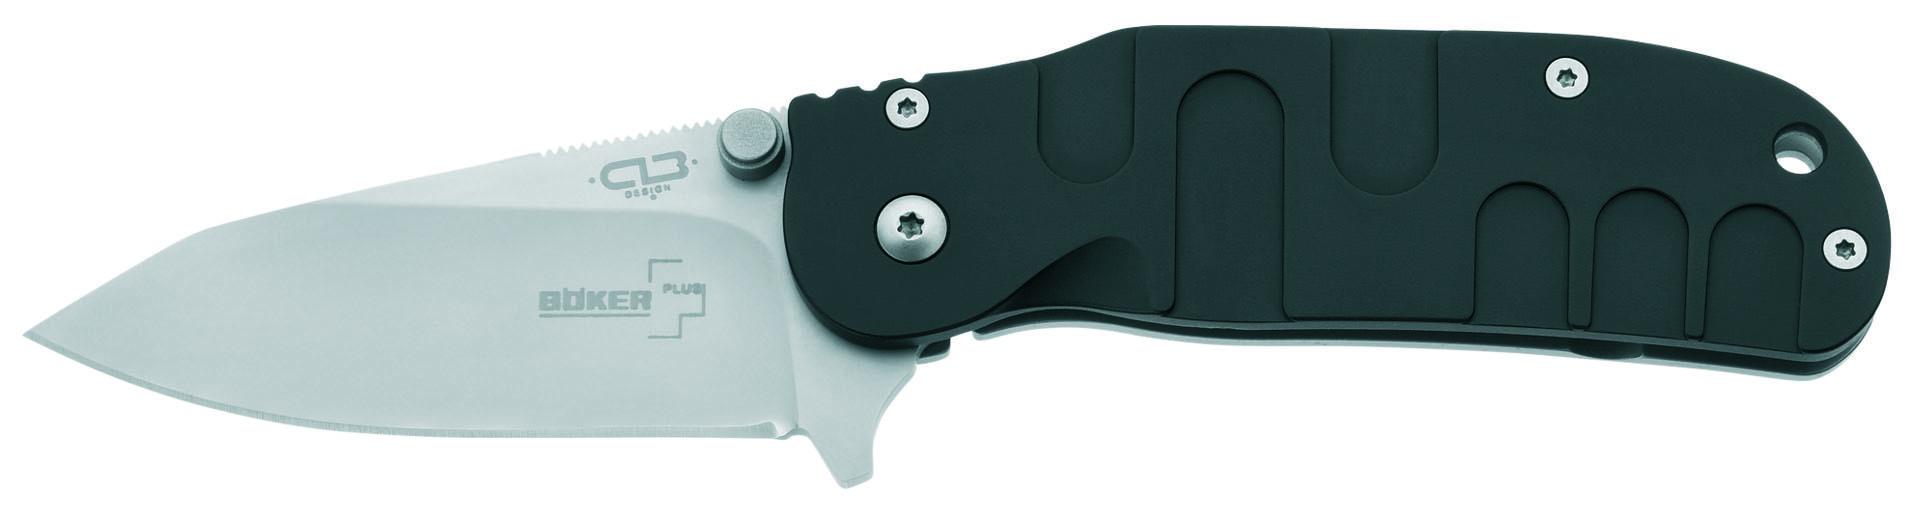 Boker 01BO585 Plus CLB Subcom Hawkbill Framelock Knife